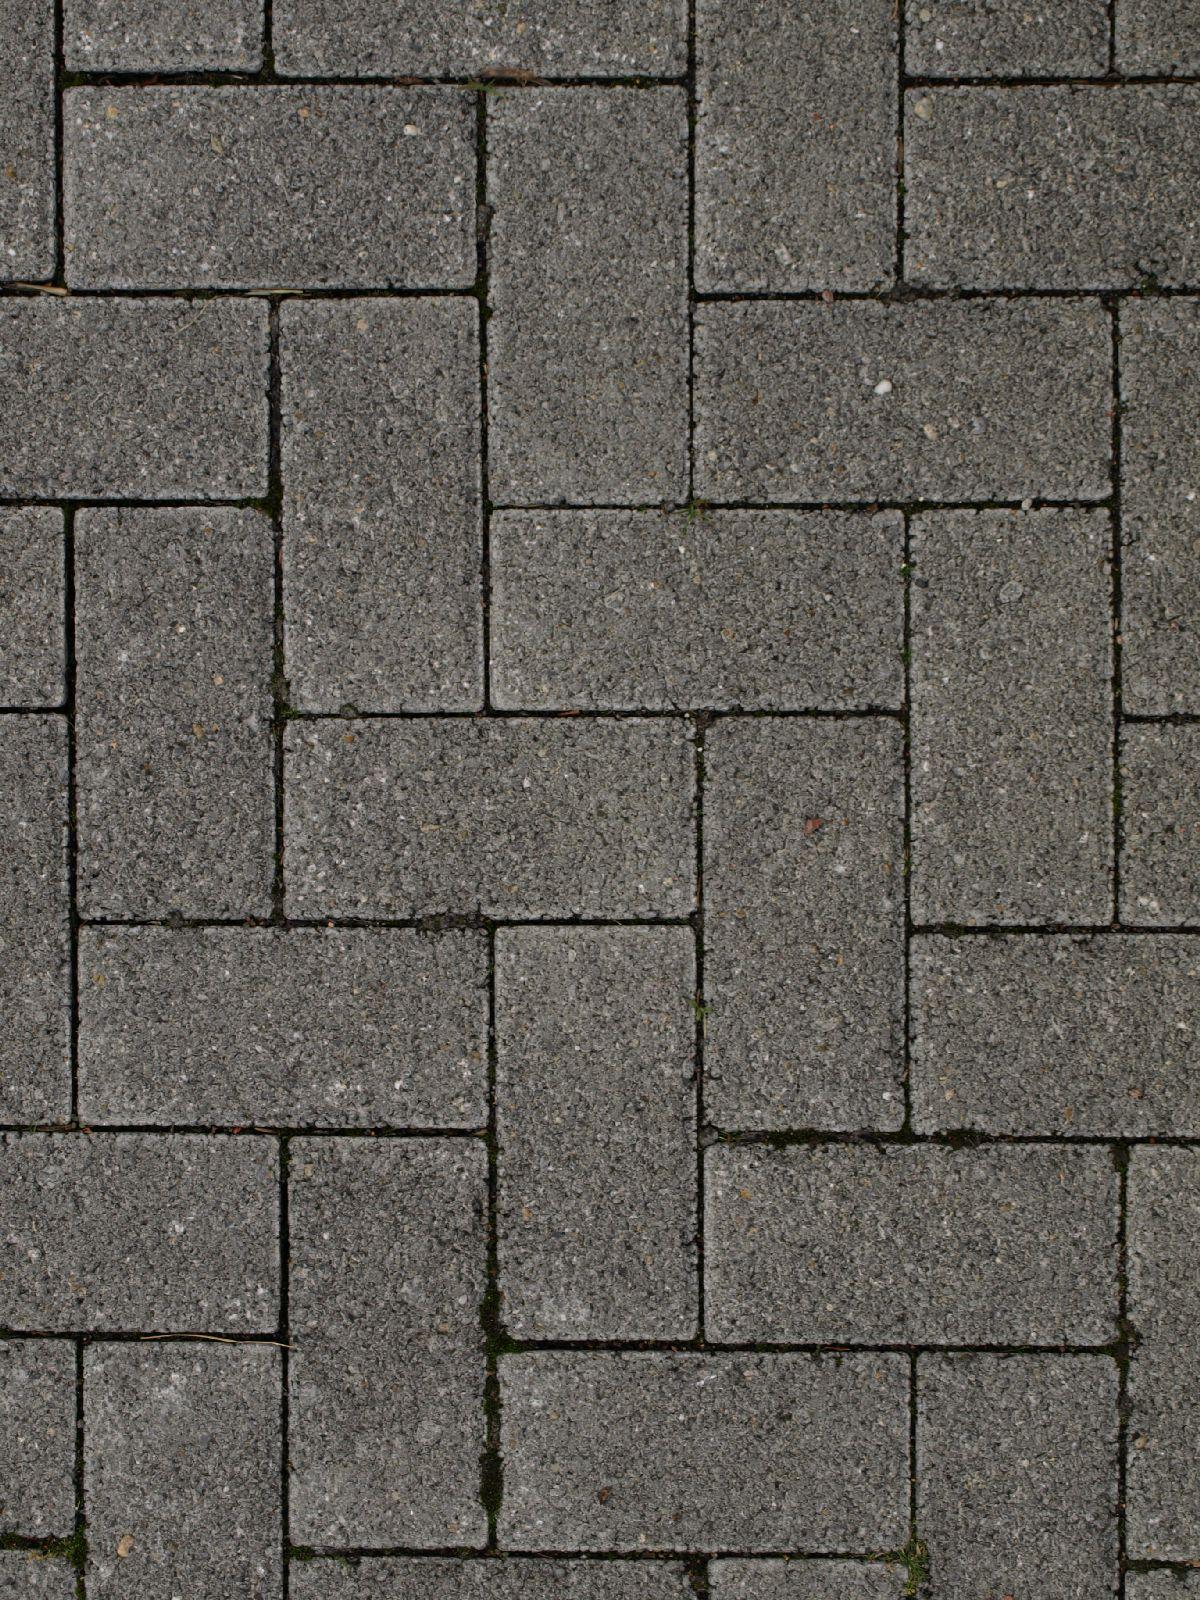 Boden-Gehweg-Strasse-Buergersteig-Textur_A_PA045740